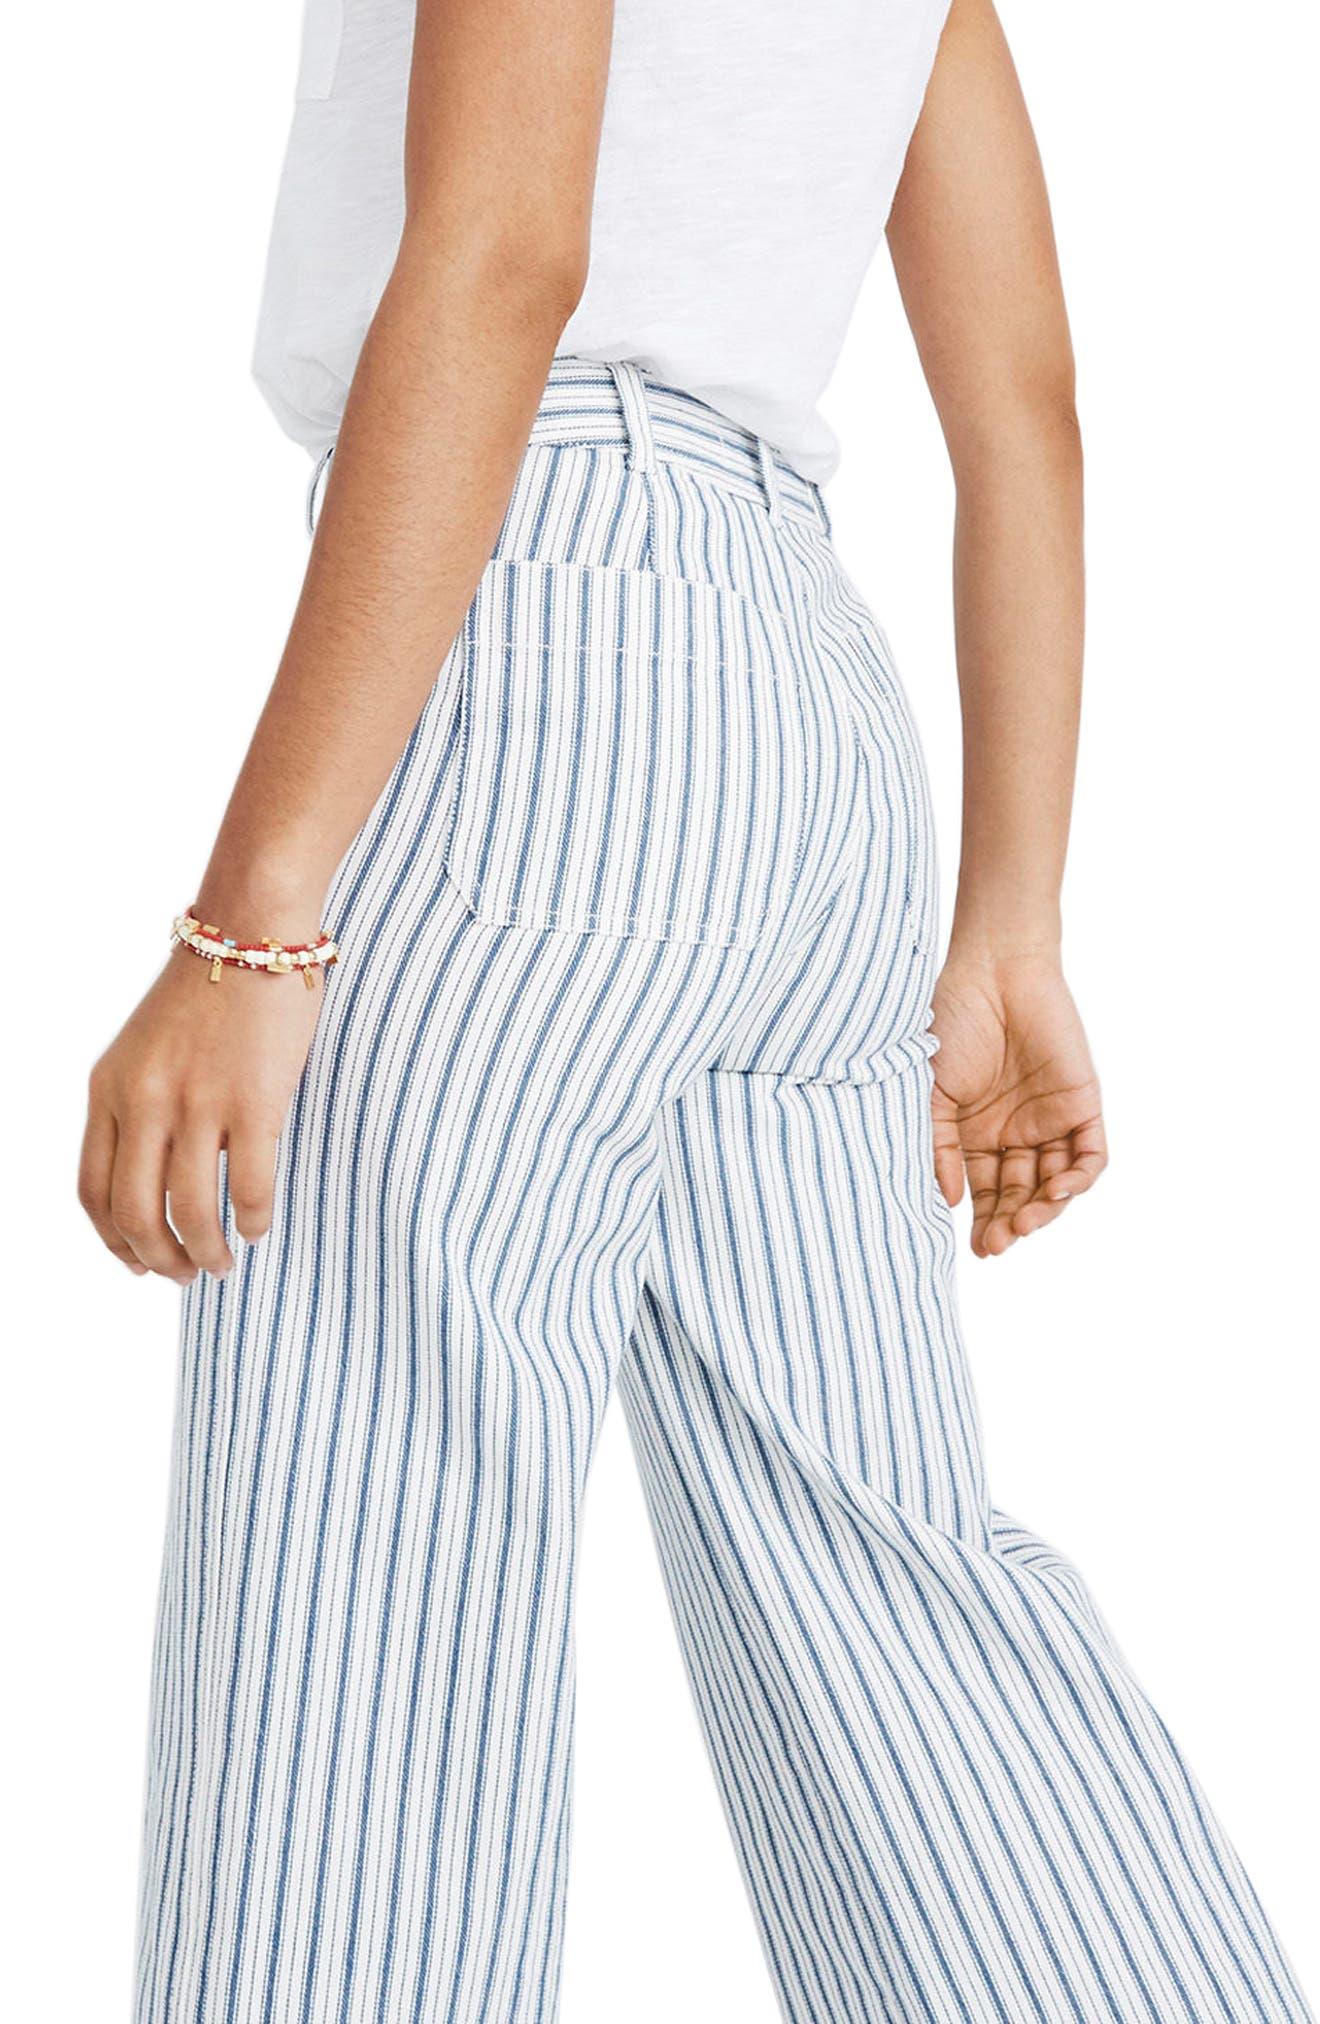 Emmett Stripe Crop Wide Leg Pants,                             Alternate thumbnail 2, color,                             400